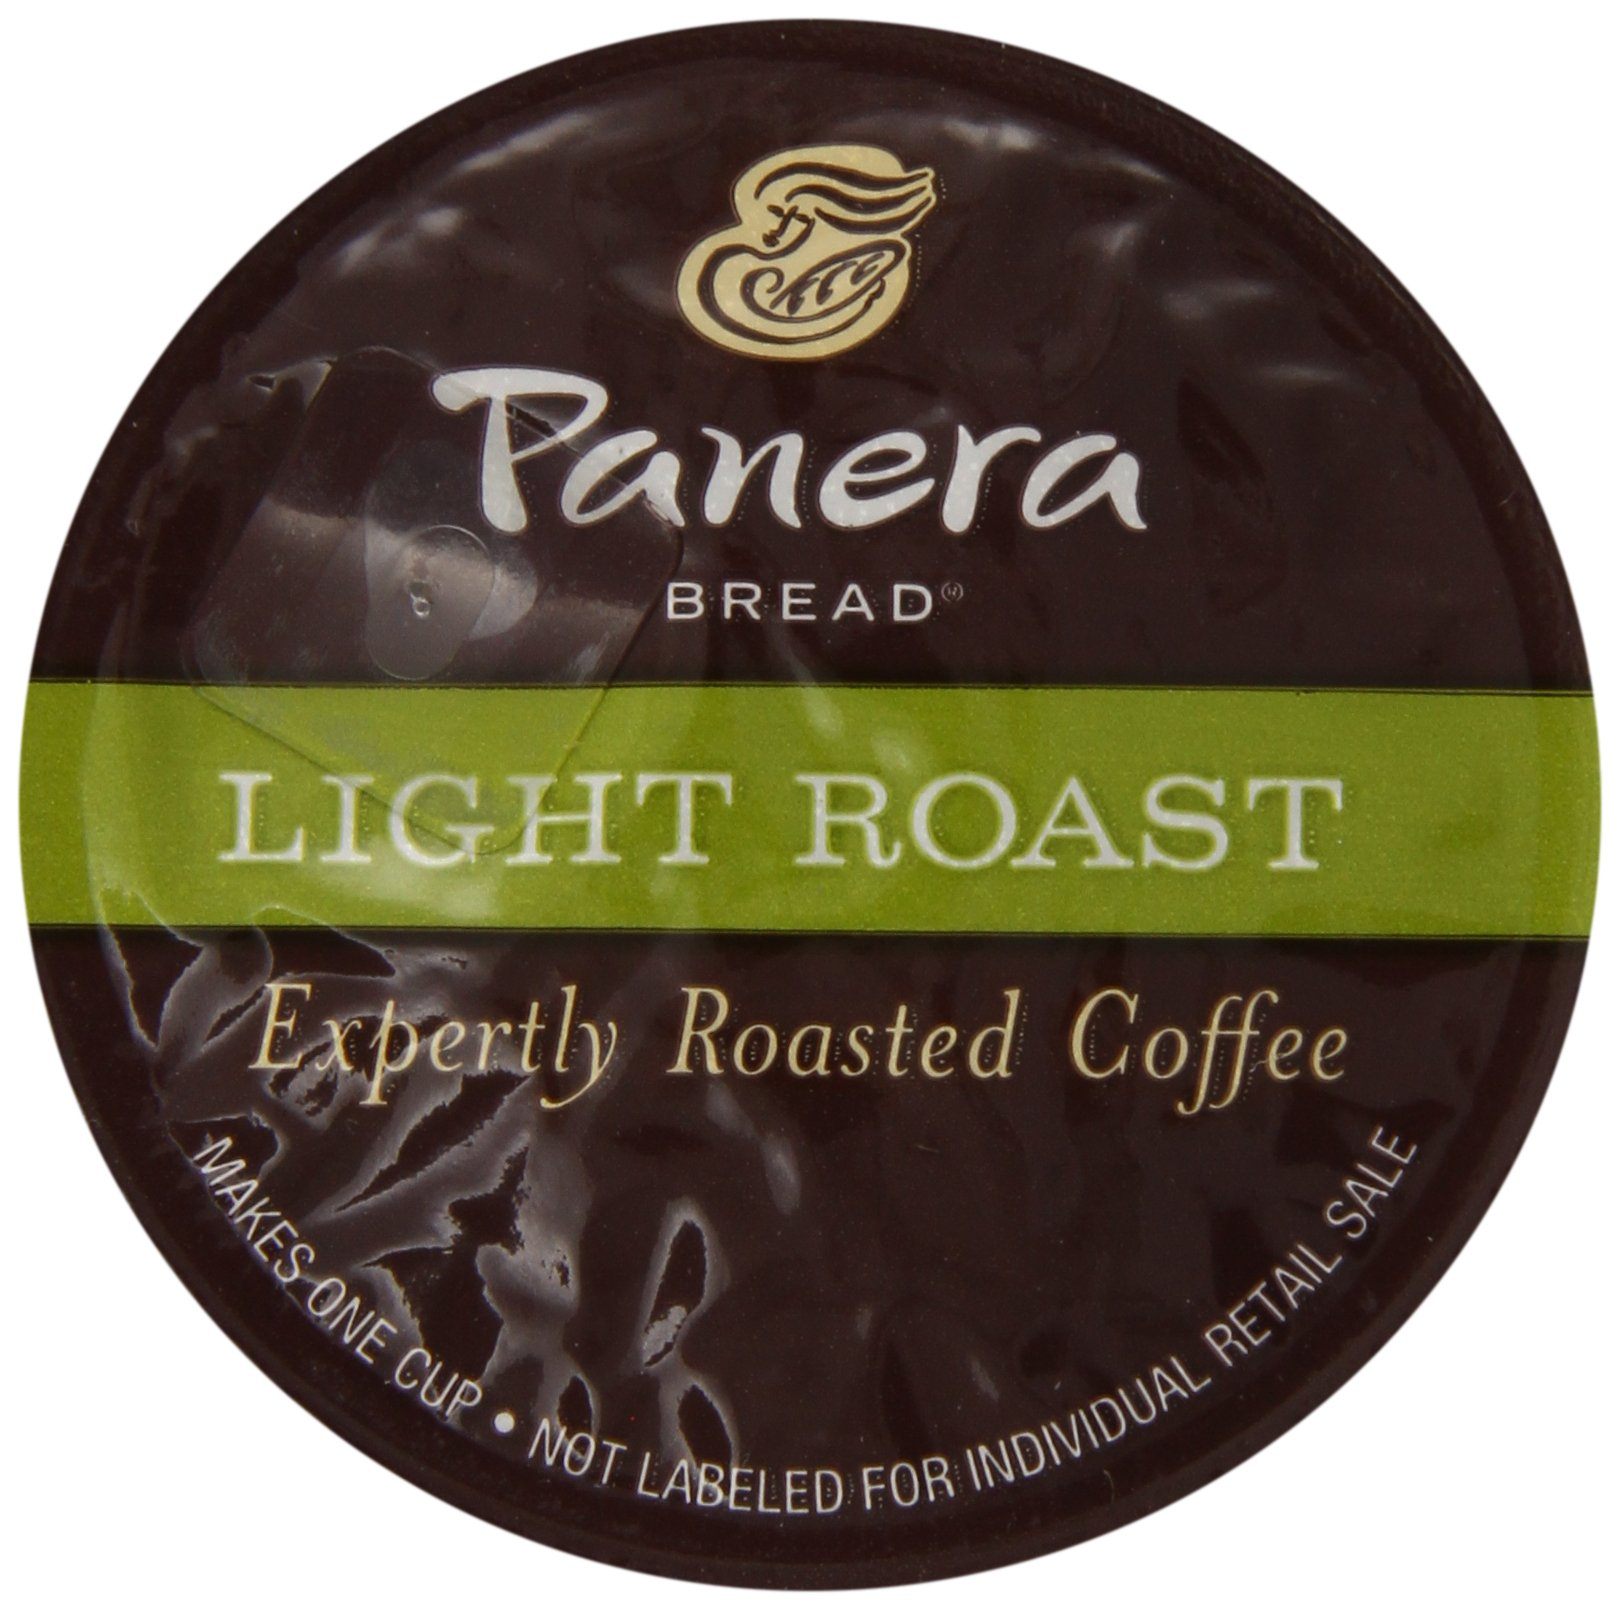 Panera Bread Coffee, Light Roast, 12 Count